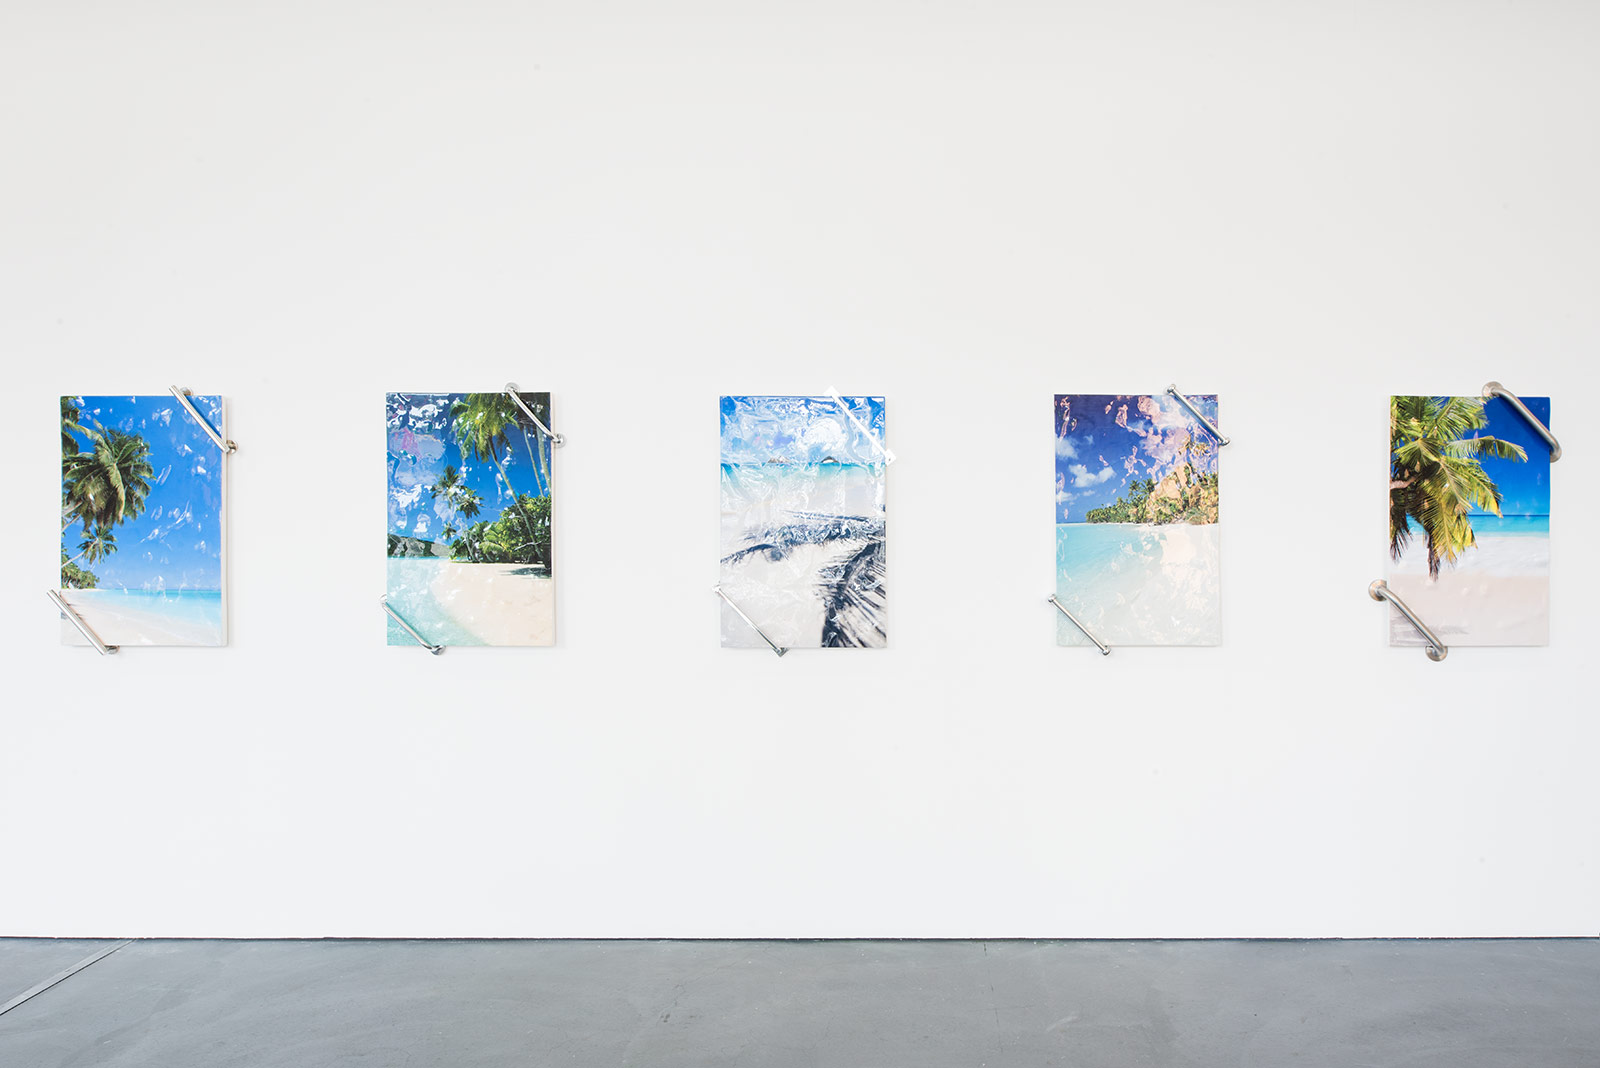 Daniel Kurth – Institut Kunst, Diplom 2017